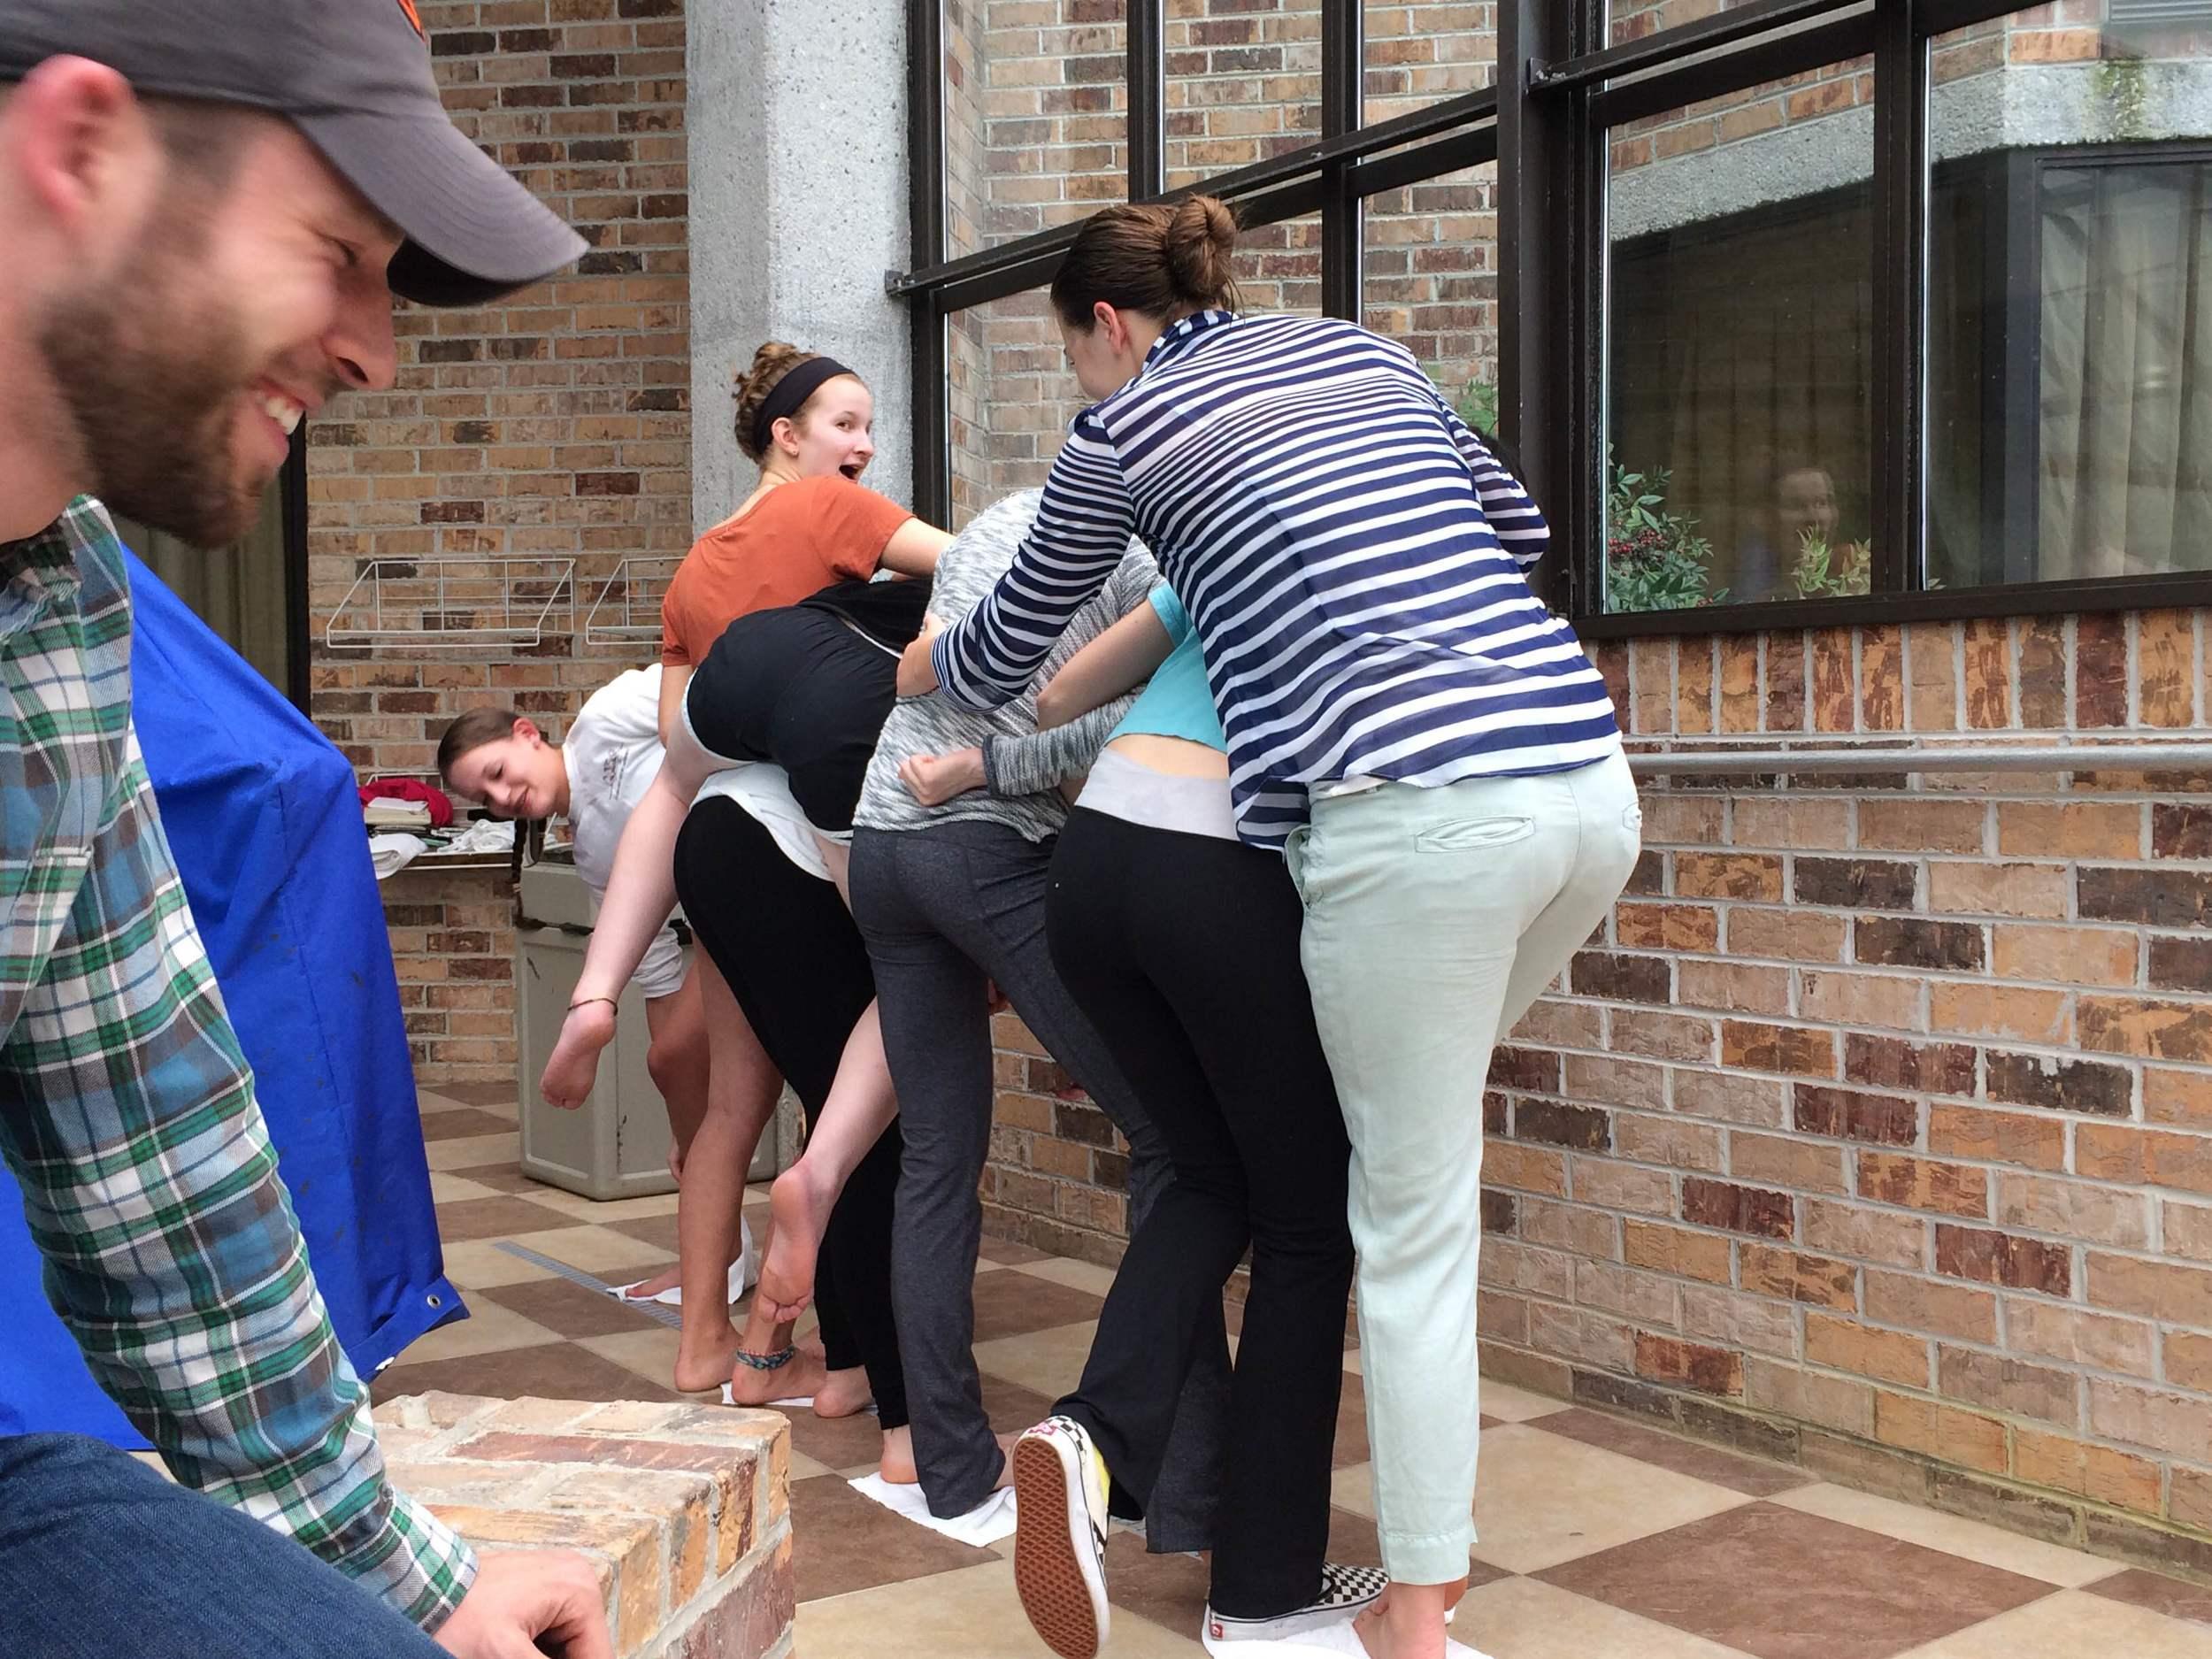 Teamwork activity on a rainy afternoon of Spring Break